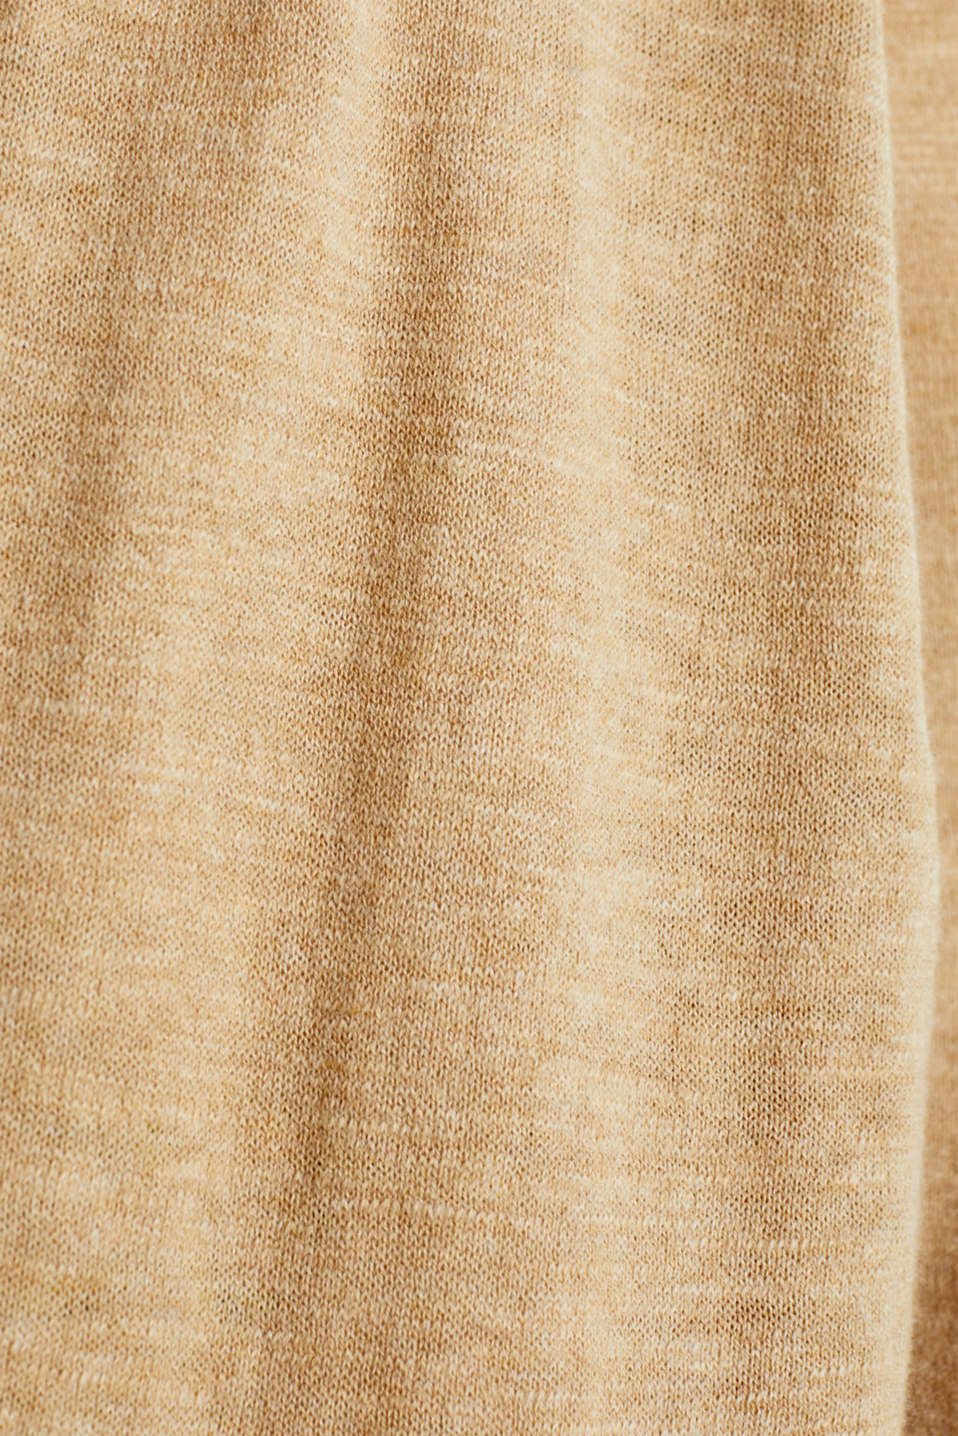 Cardigan, 100% cotton, LIGHT BEIGE 5, detail image number 4